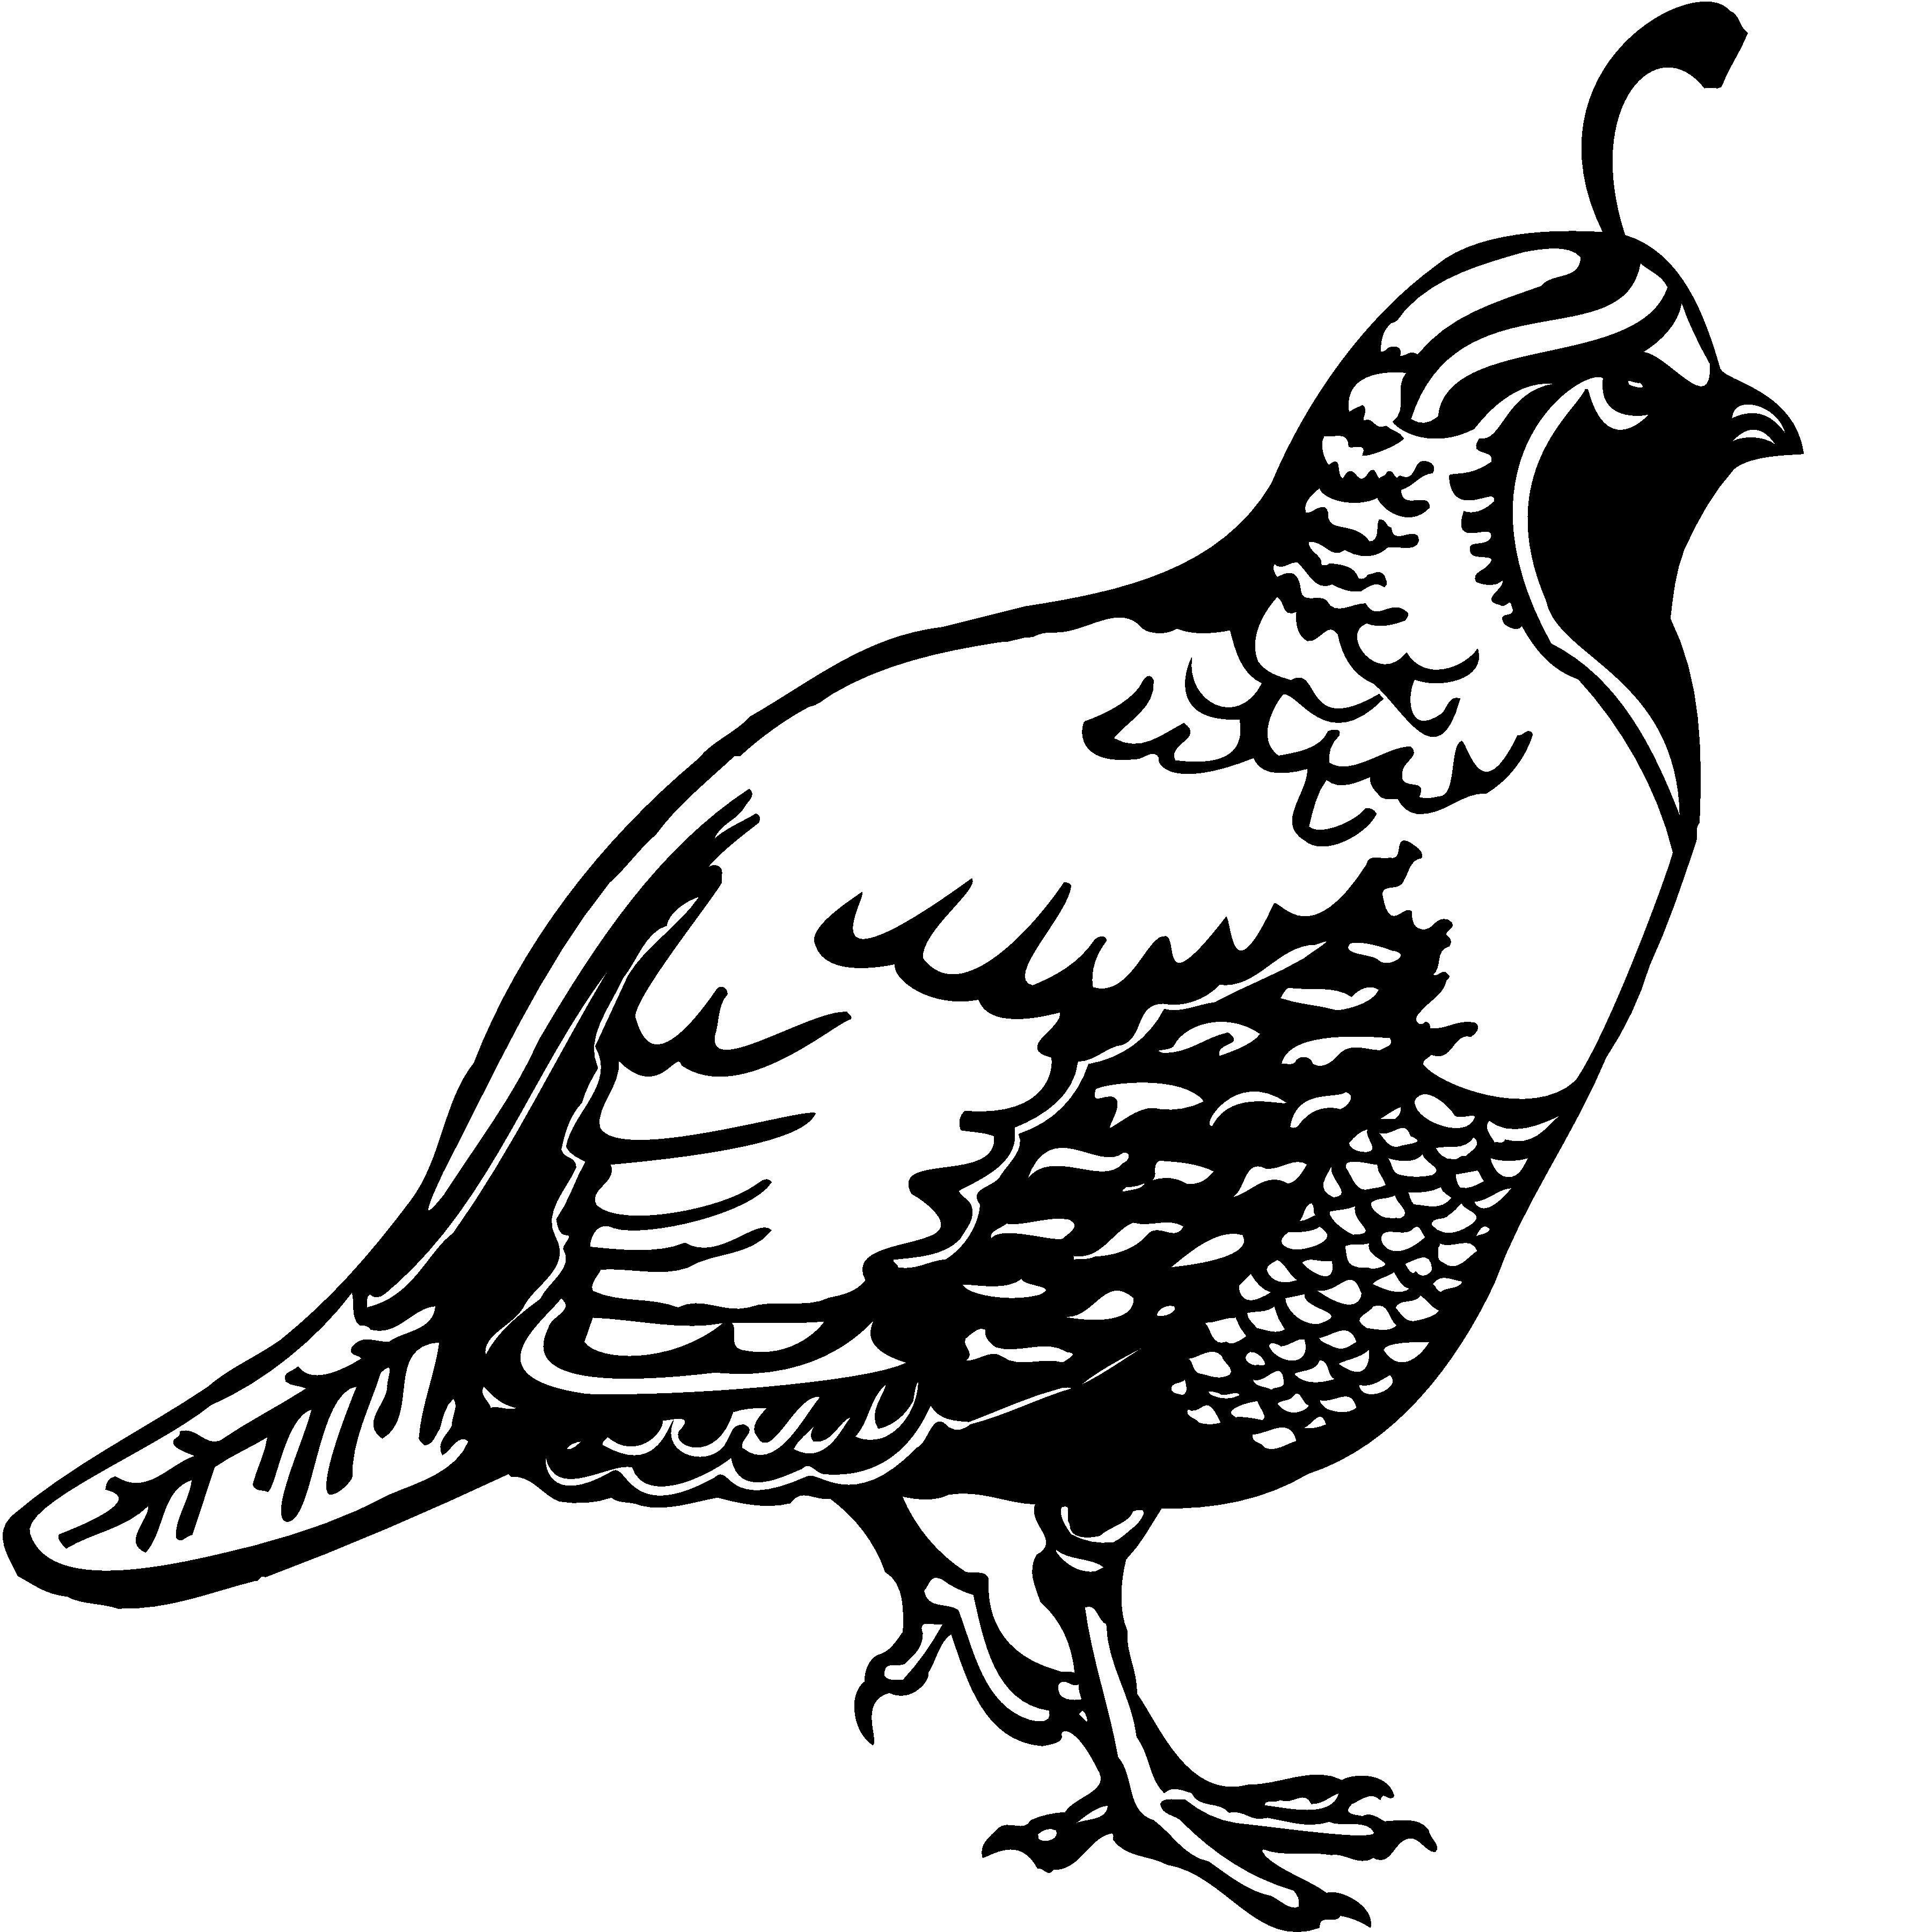 animal quail clip art tattoo ideas pinterest art drawings